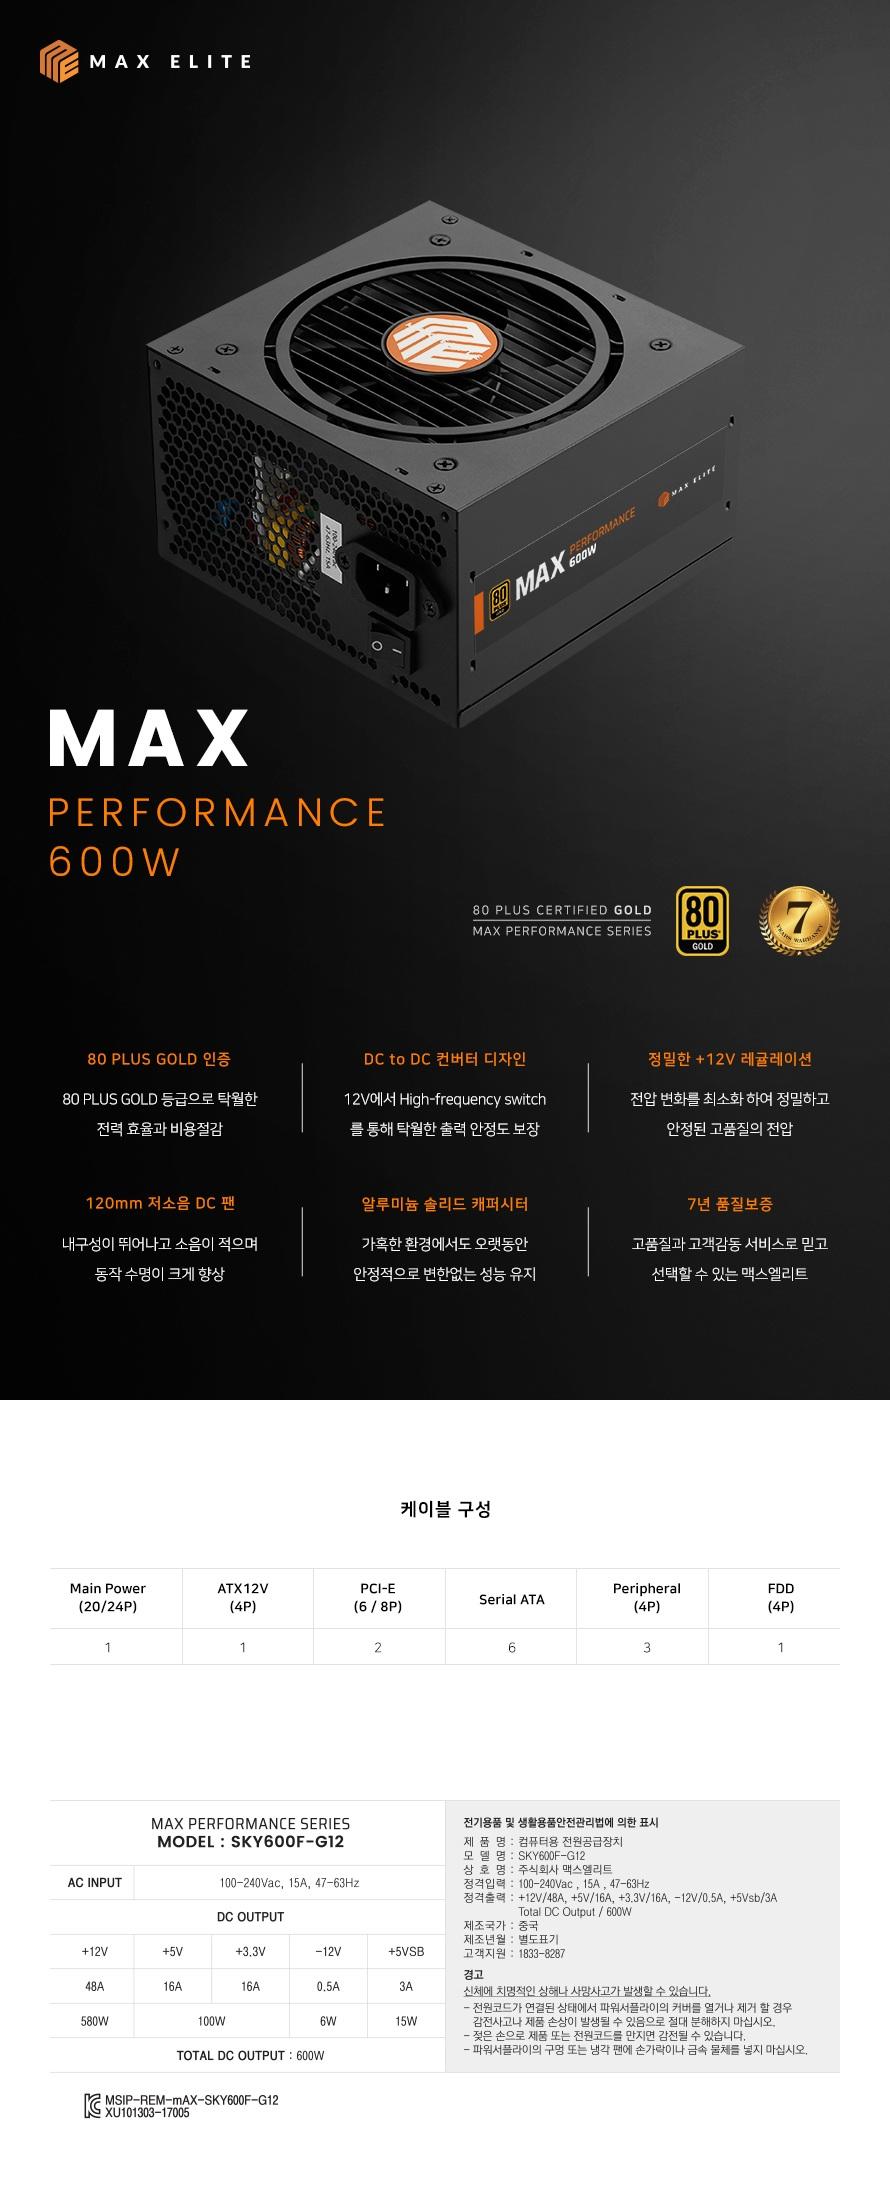 MAX Performance 600W 80PLUS GOLD.jpg